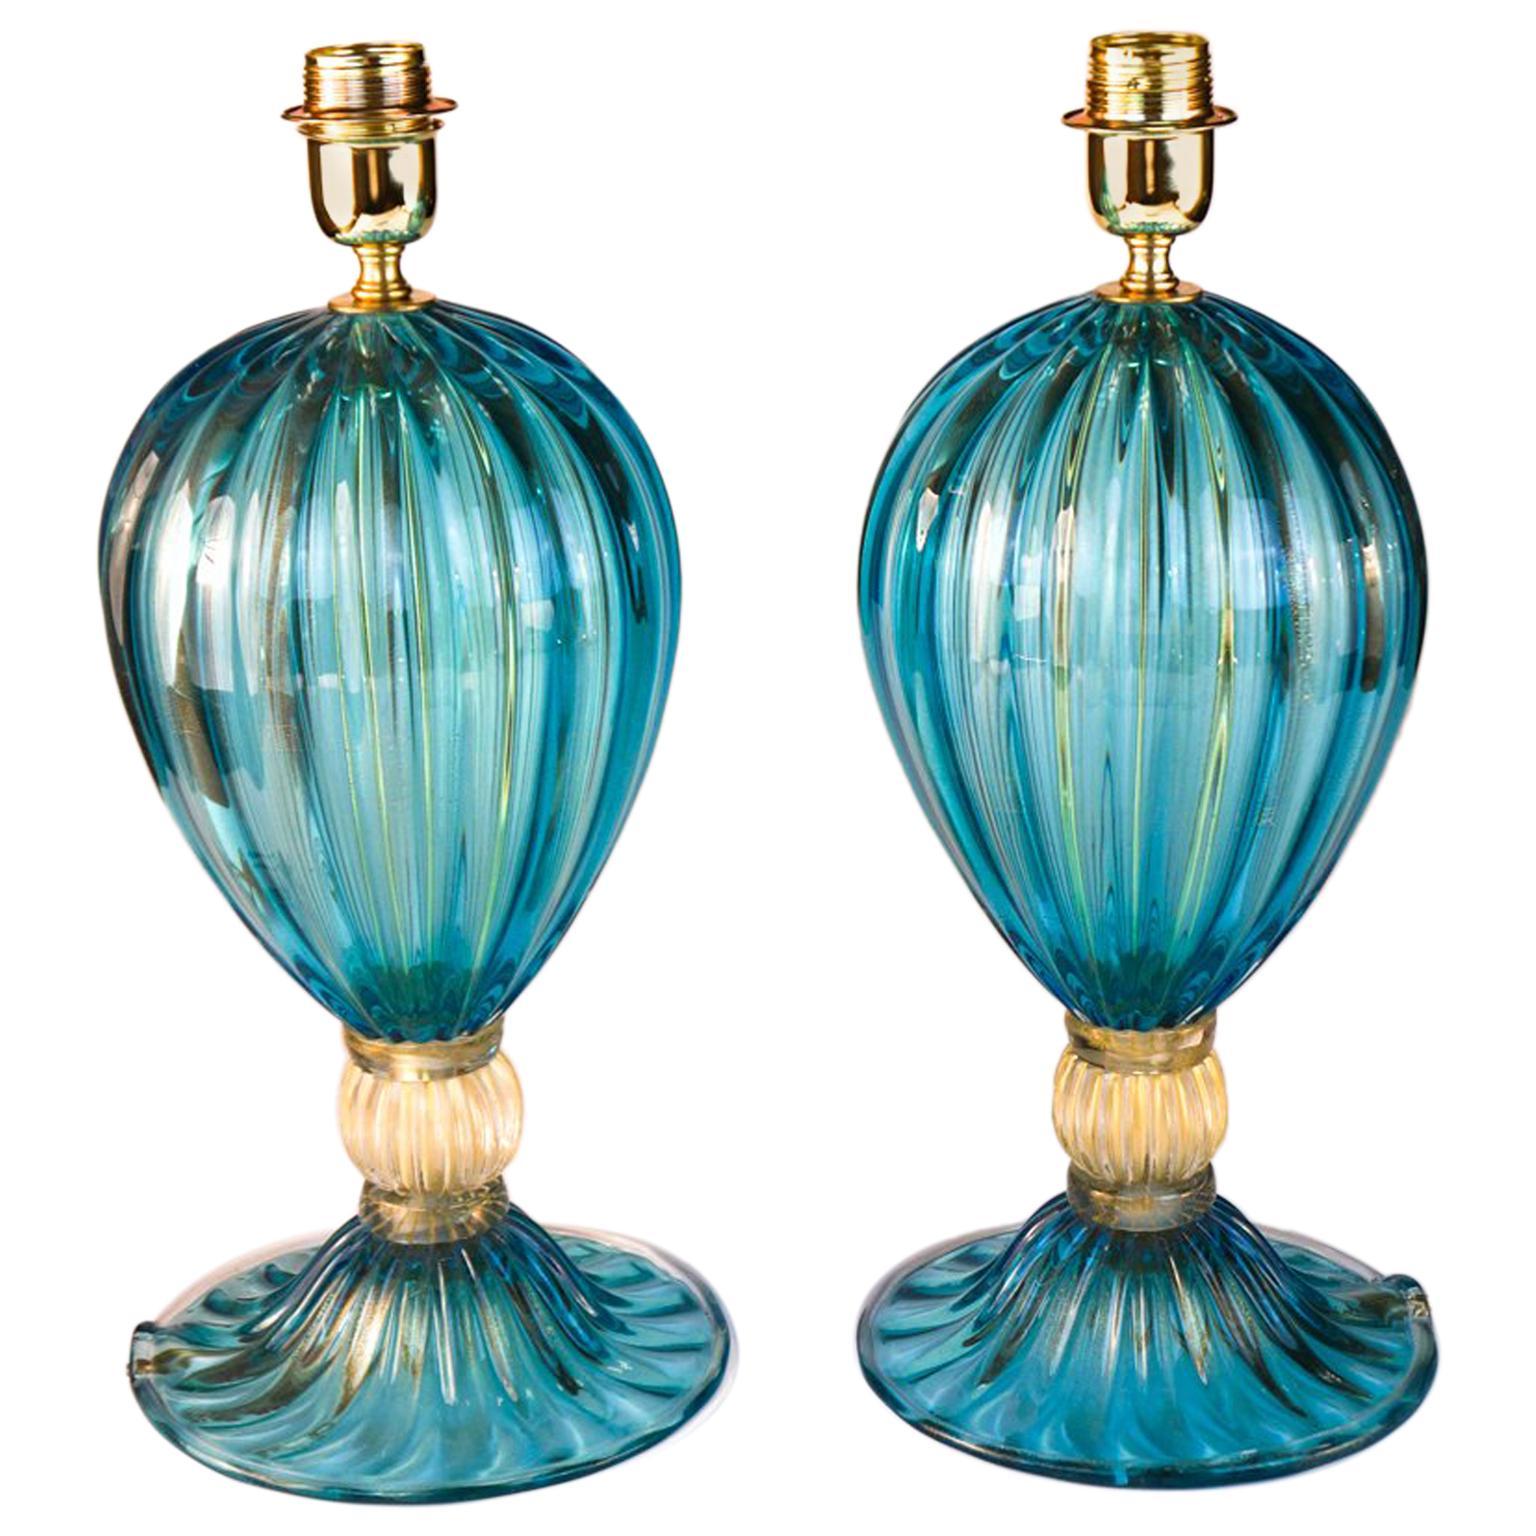 Alberto Donà Pair of Aquamarine Italian Murano Glass Table Lamps Veronese, 1980s